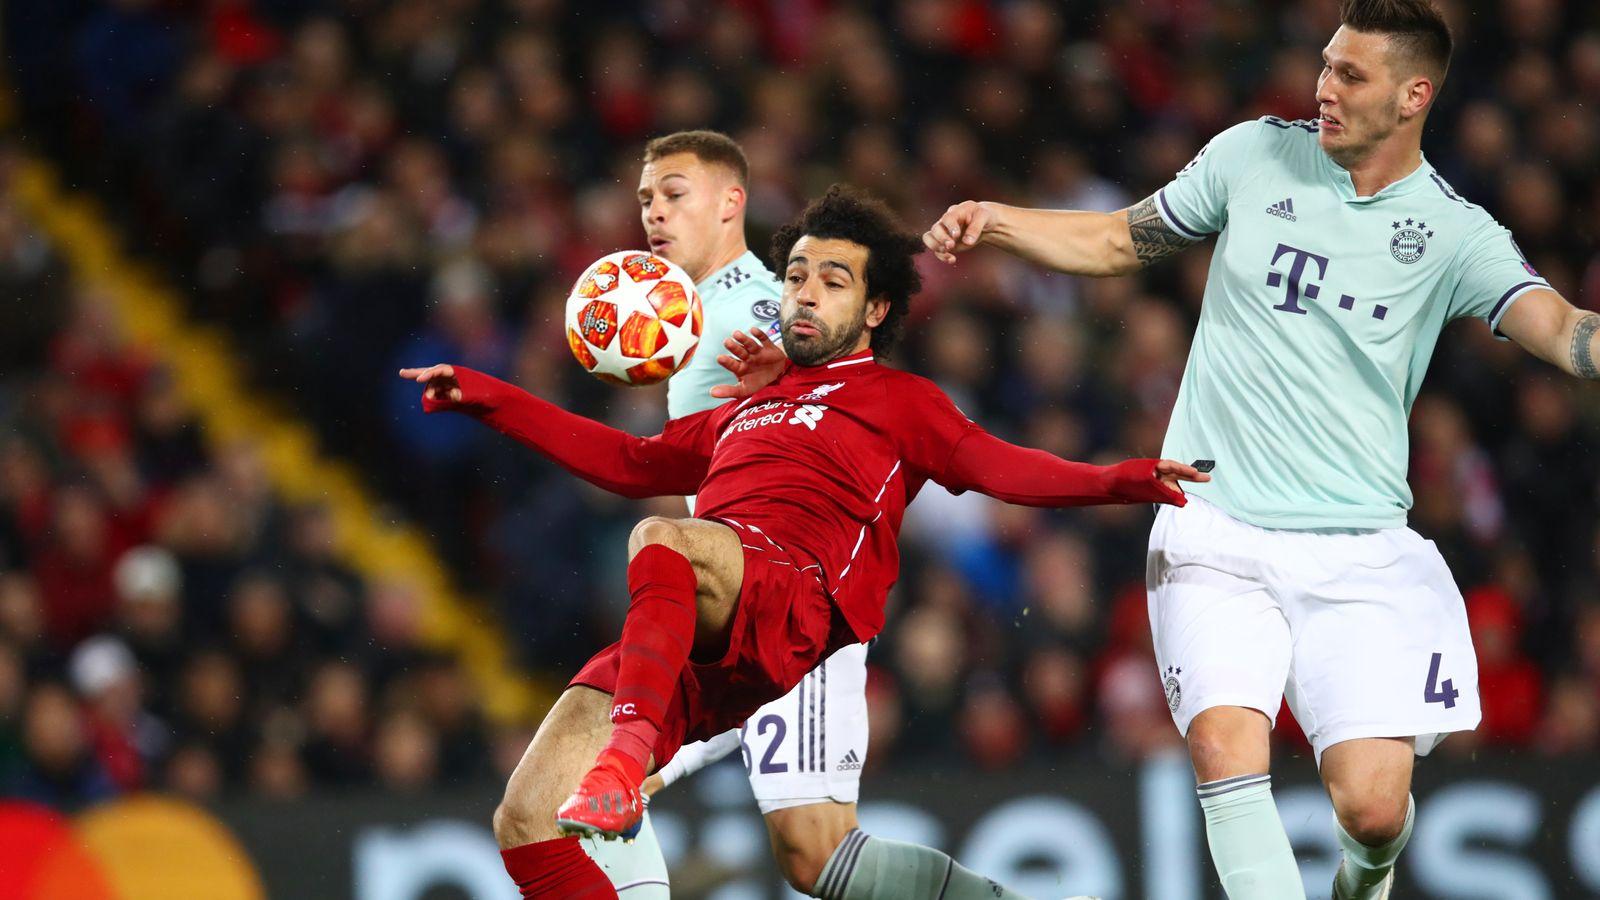 Liverpool 0 - 0 Bay Munich - Match Report & Highlights